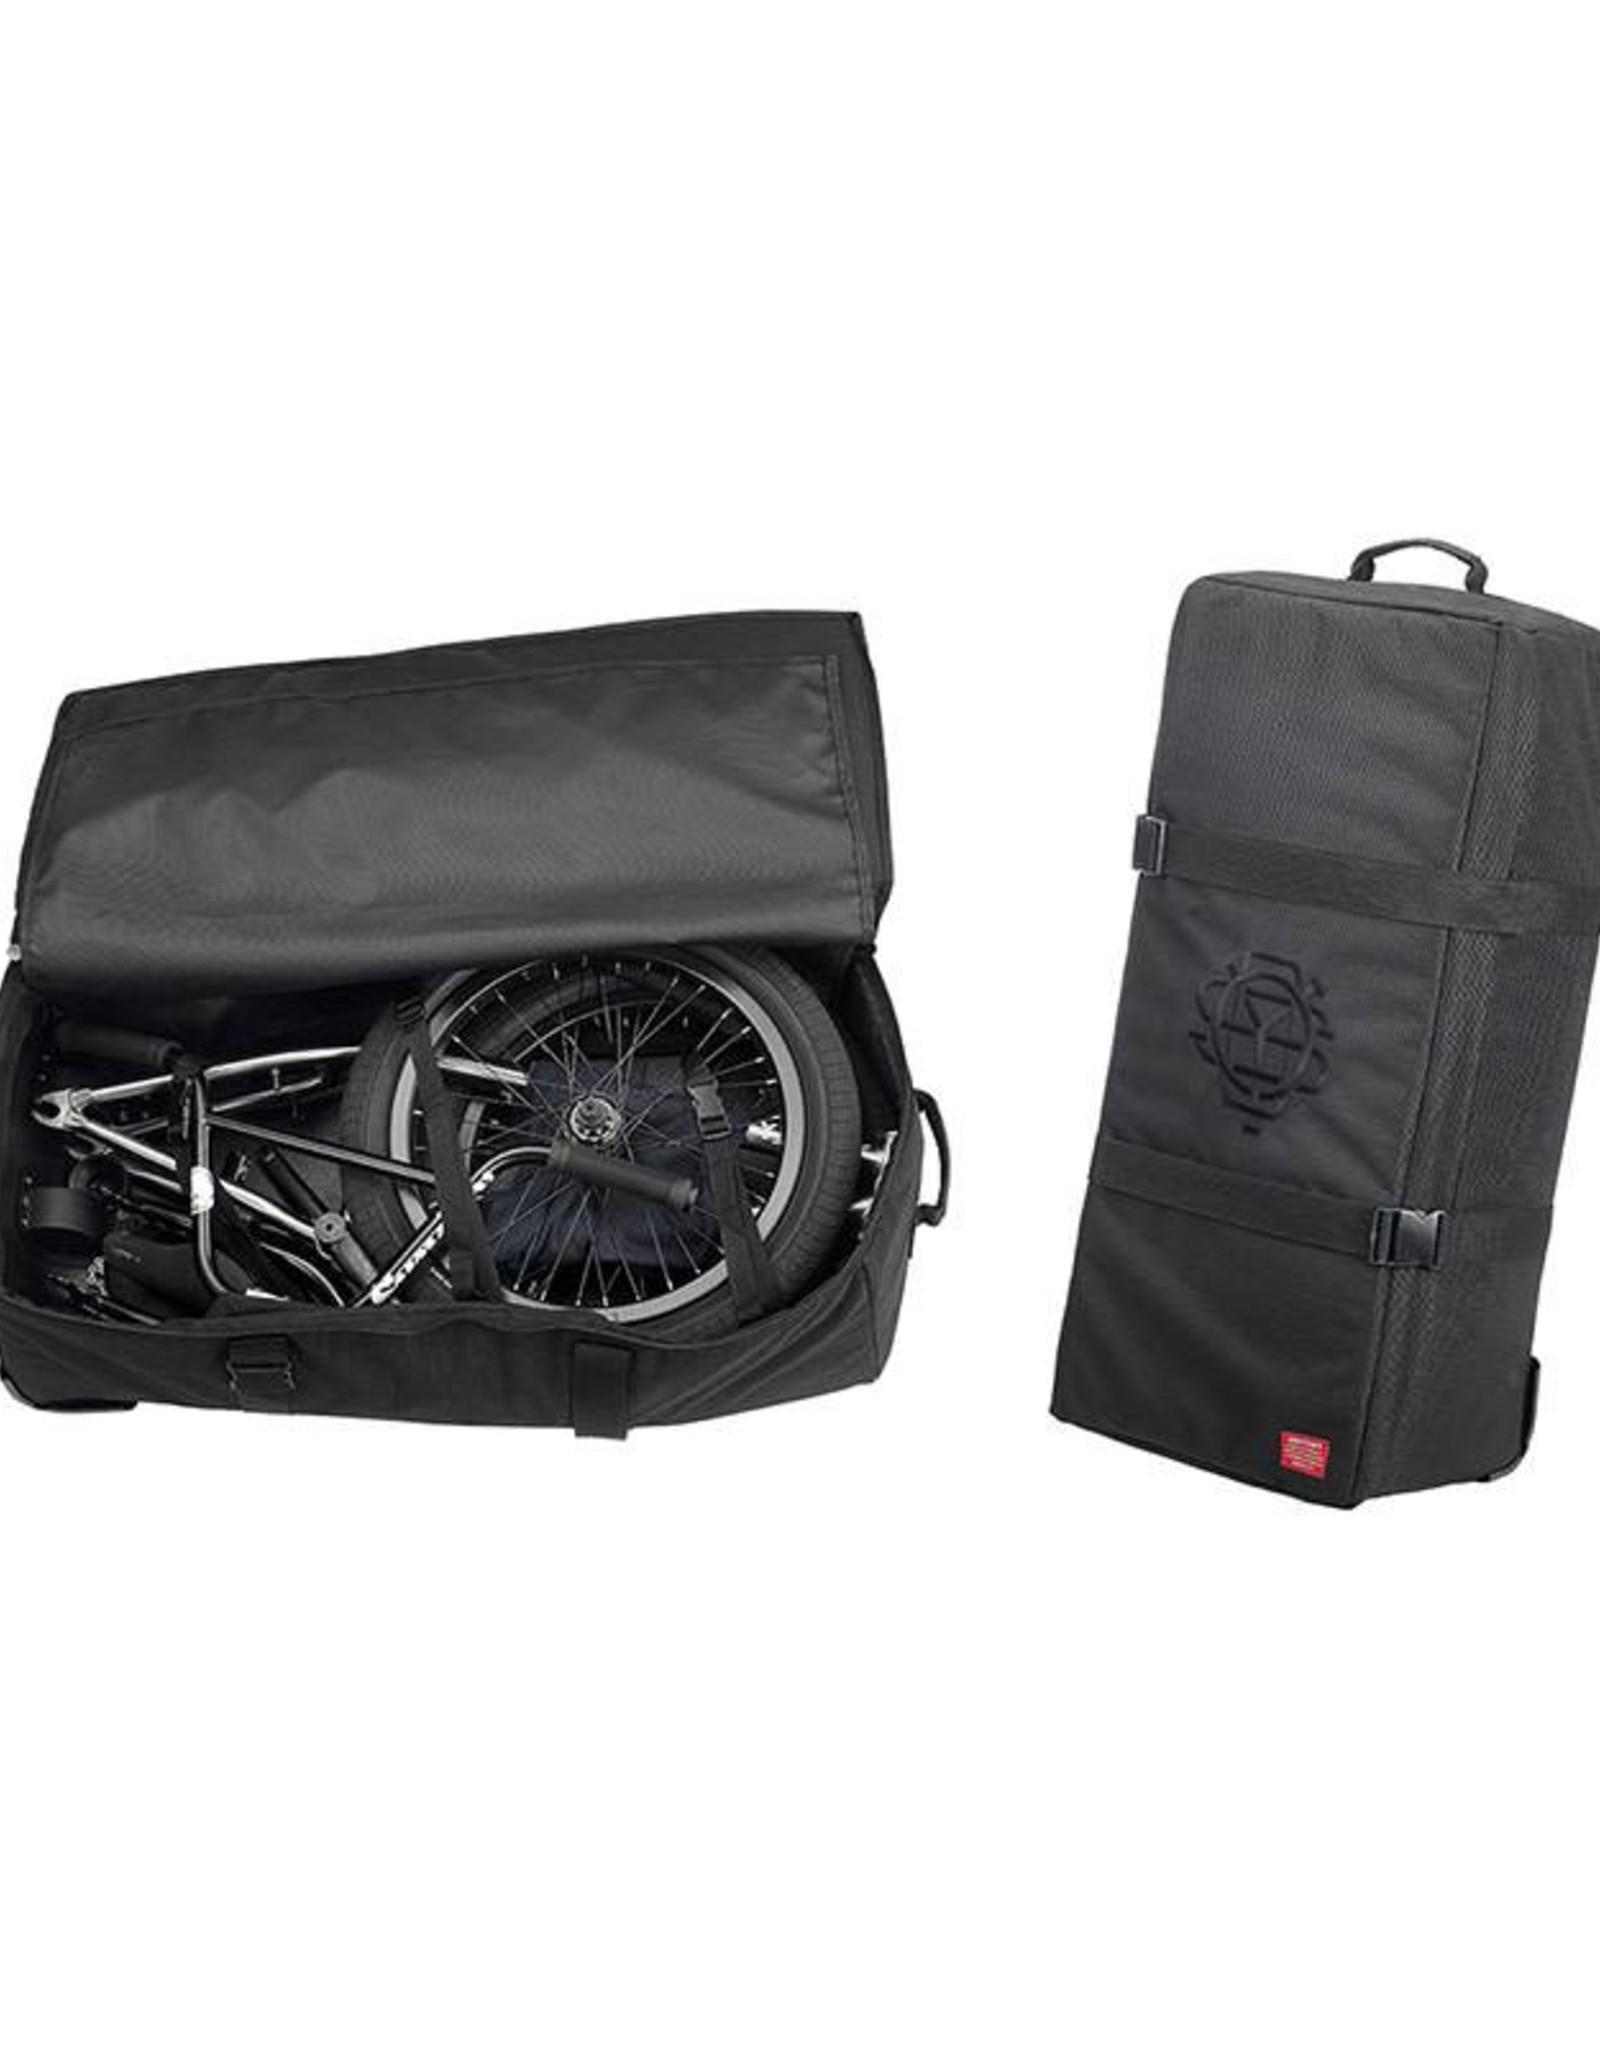 Odyssey Odyssey Bike Travel Bag